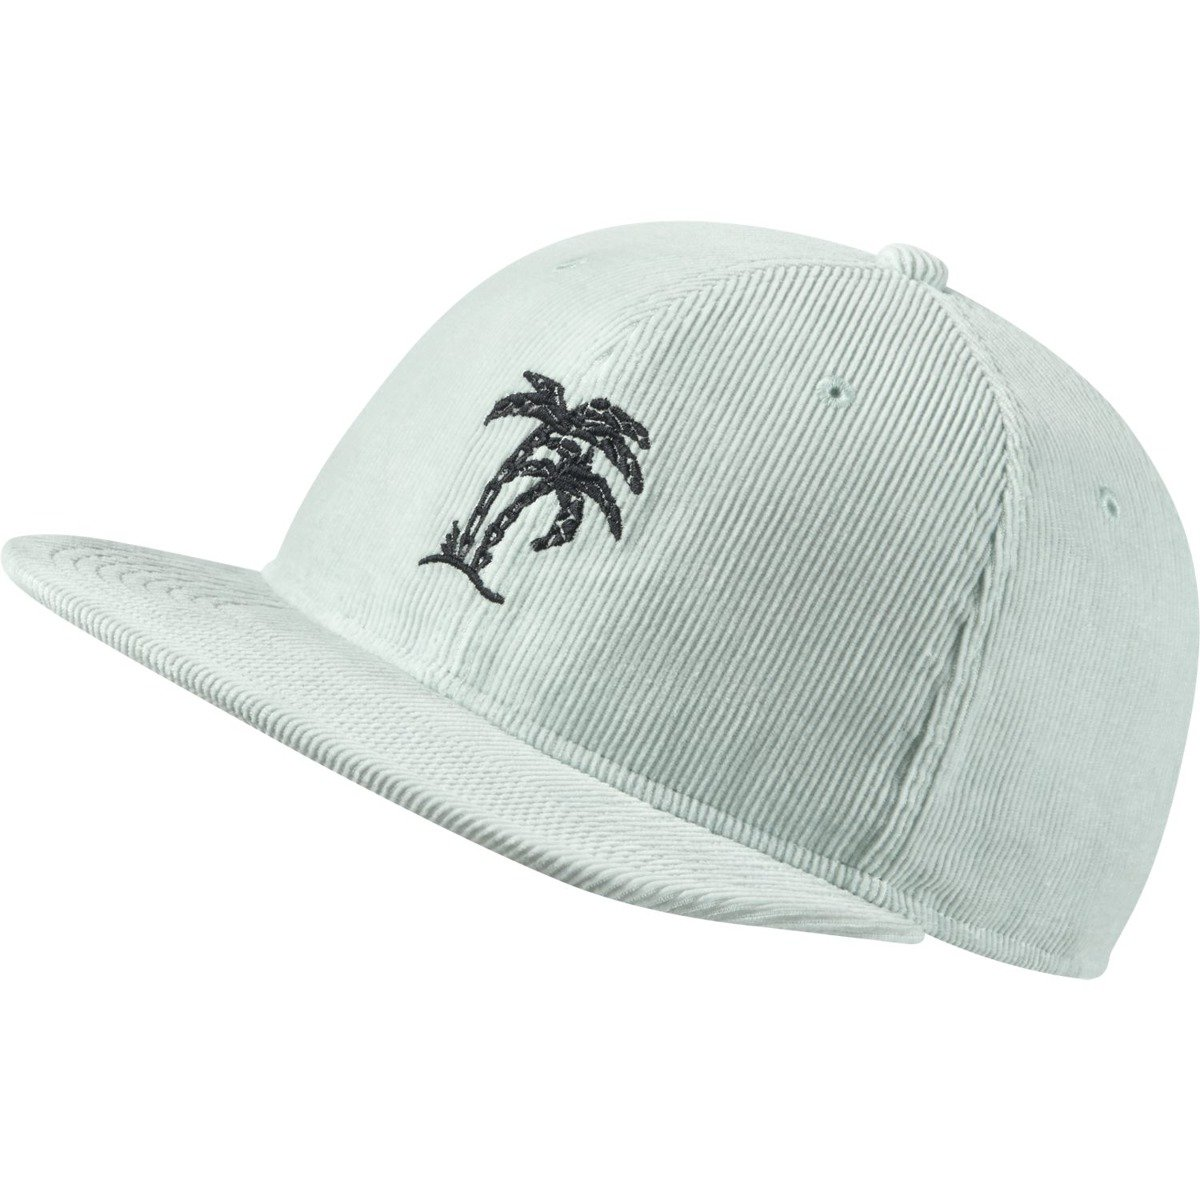 finest selection 92d22 68e58 nike sb hat barely green black baroque brown black green   Clothes   Cap    Cap SALE   Sale 50% -70%   Cap Brands   Nike SB Odzież   Nike SB   Summer  2016 ...